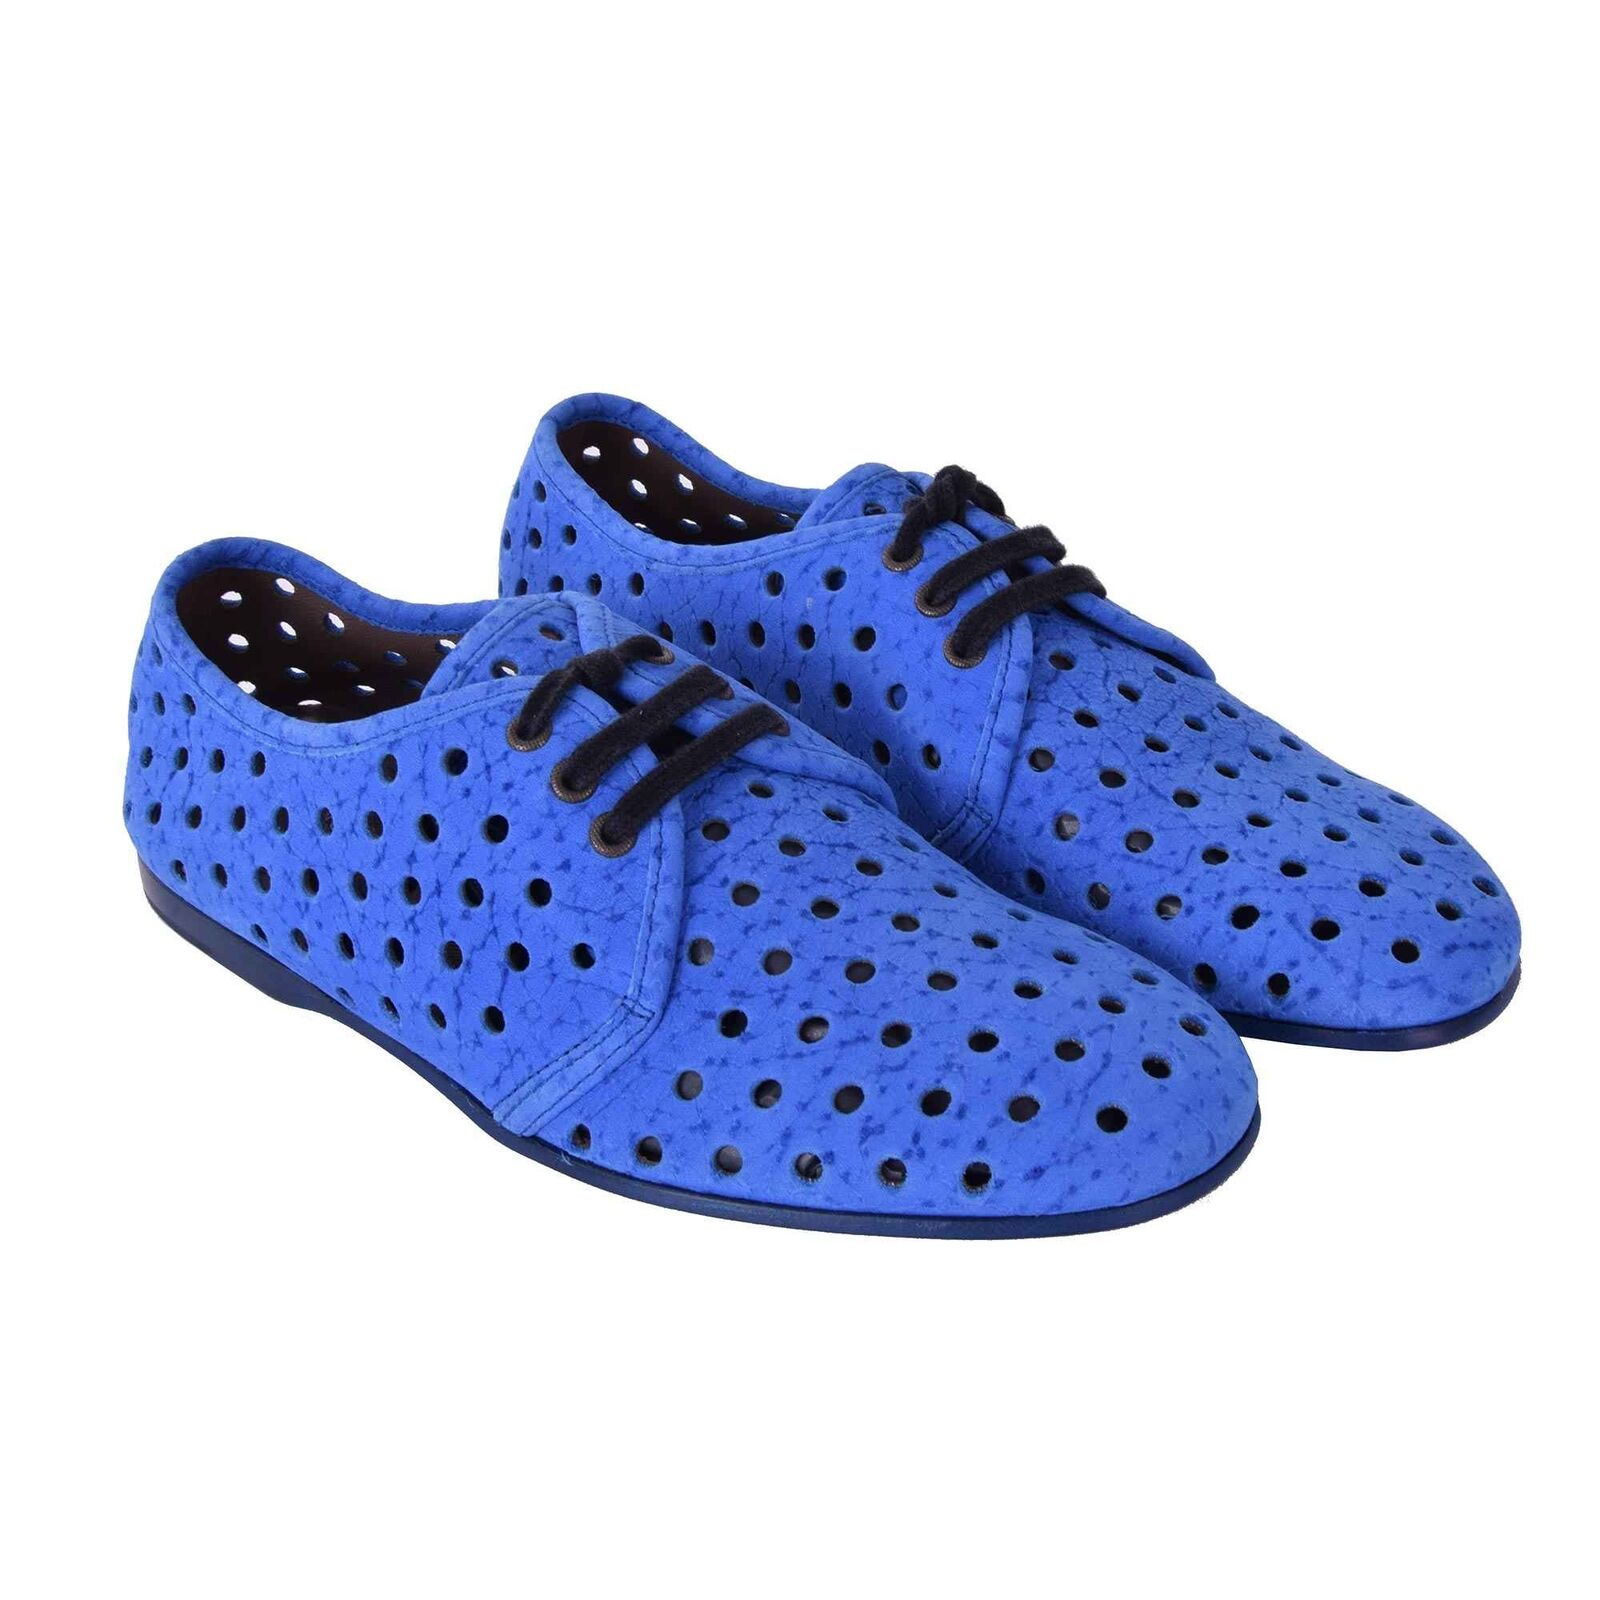 DOLCE Derby & GABBANA Perforierte Wildleder Derby DOLCE Schuhe AMALFI Blau Schuhes Blau 05917 a7b7e6